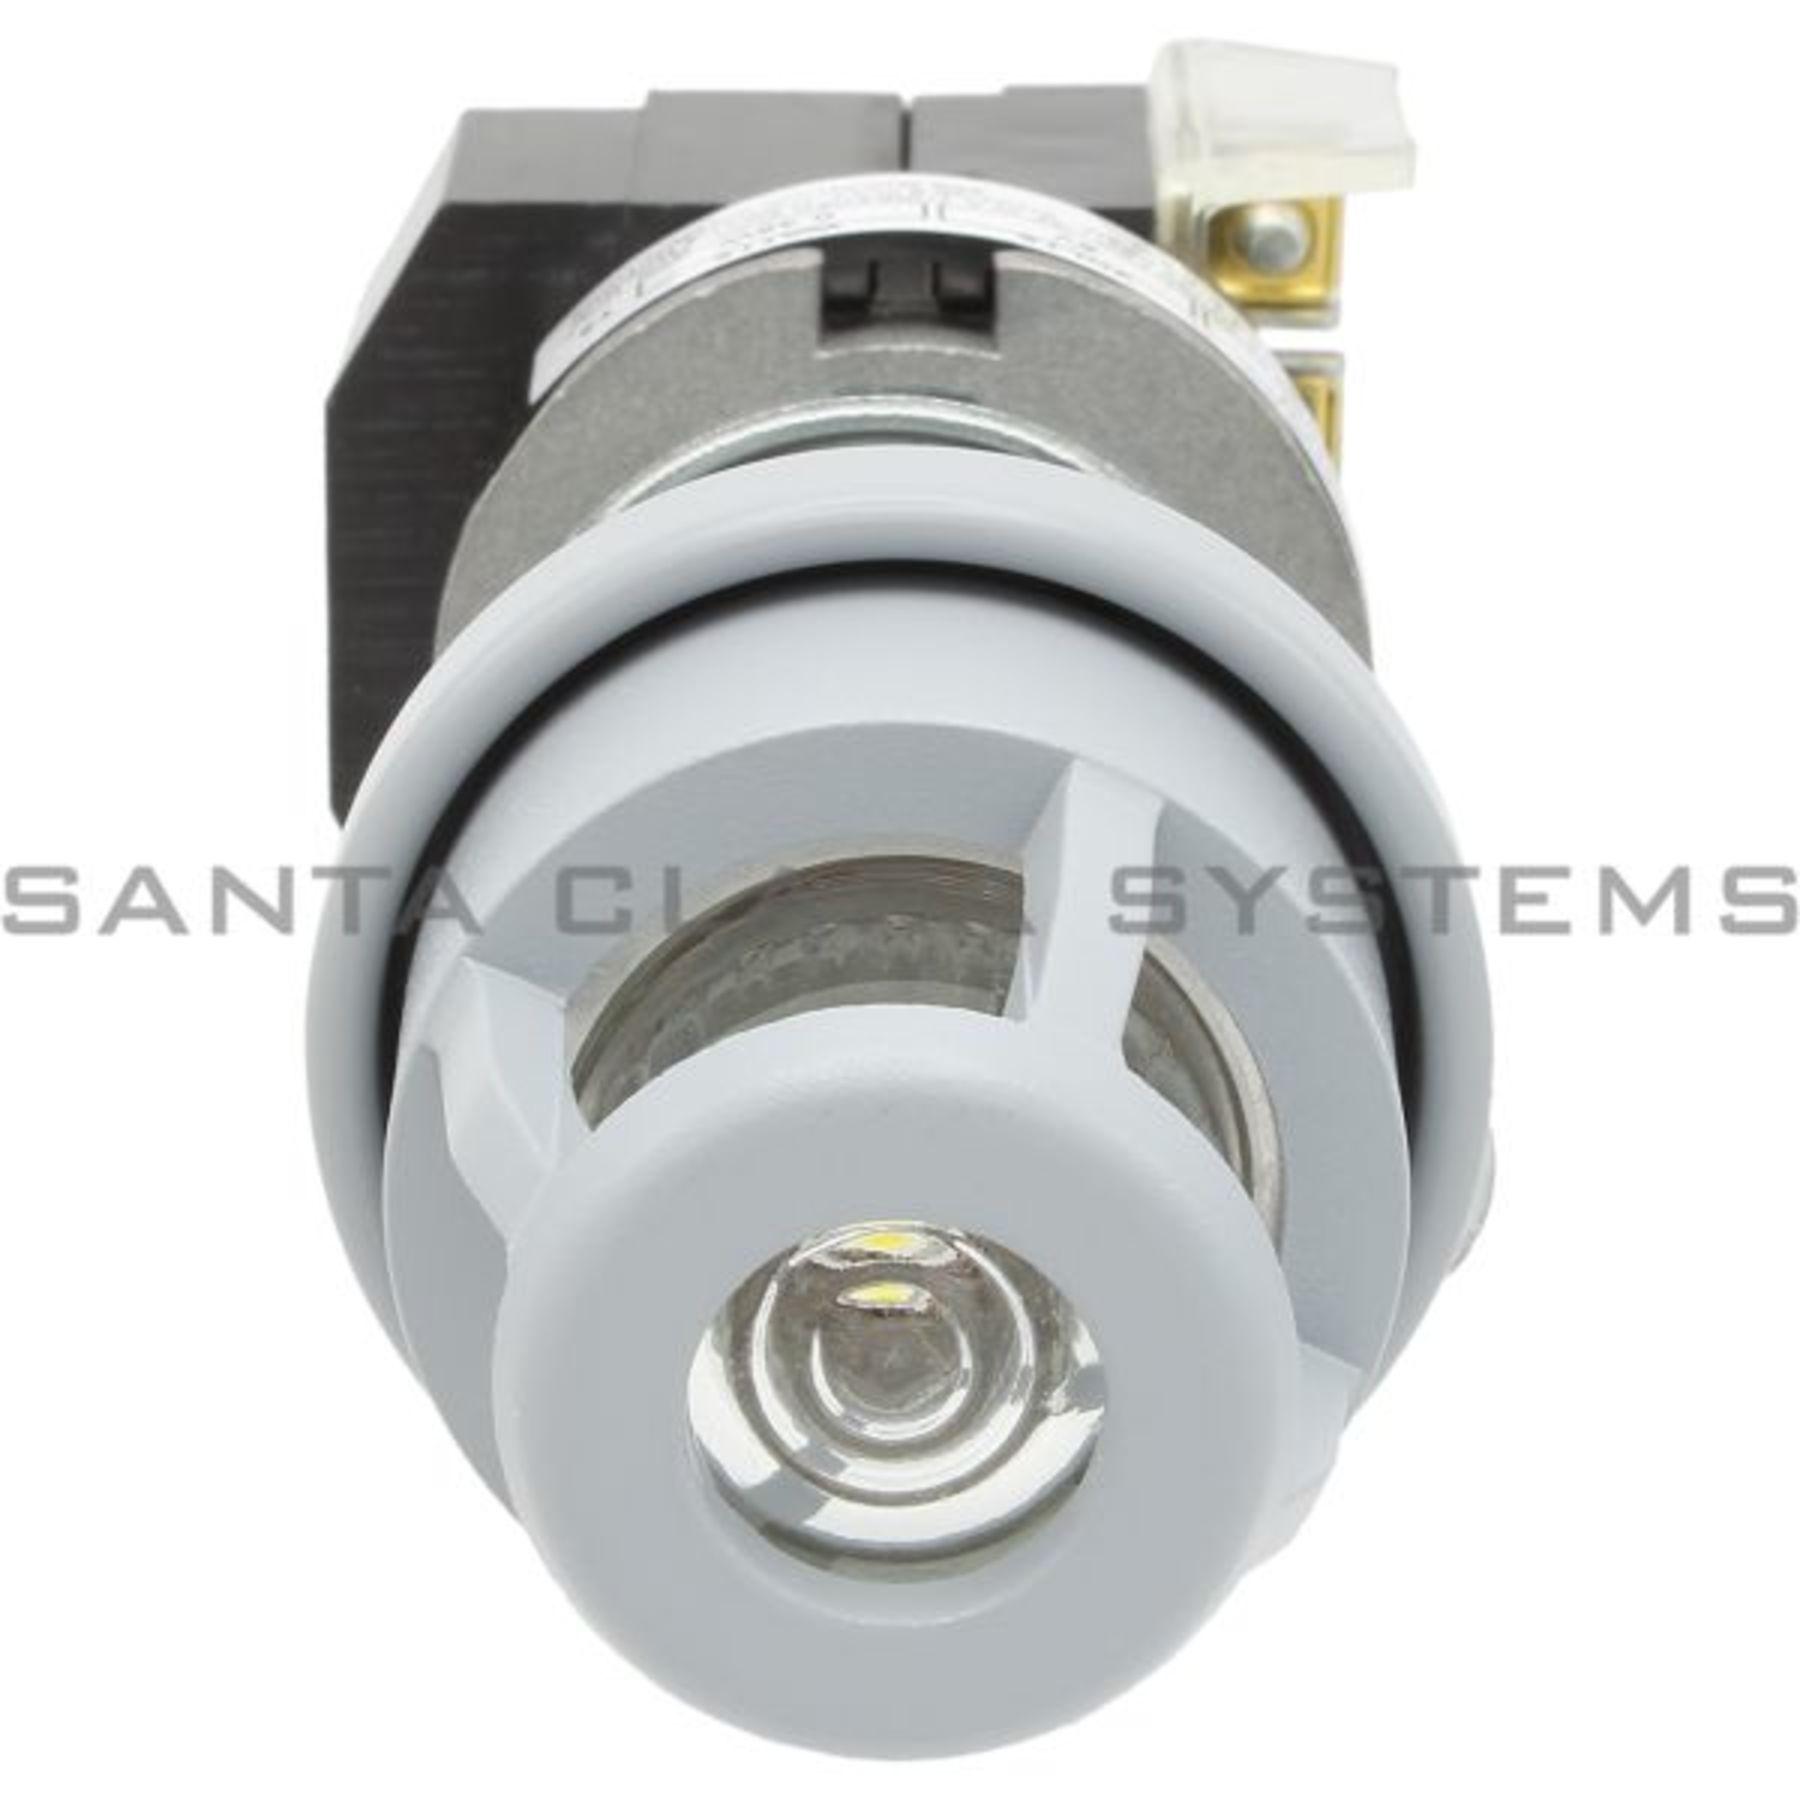 allen bradley 800h-ppbh16m push button switch product image